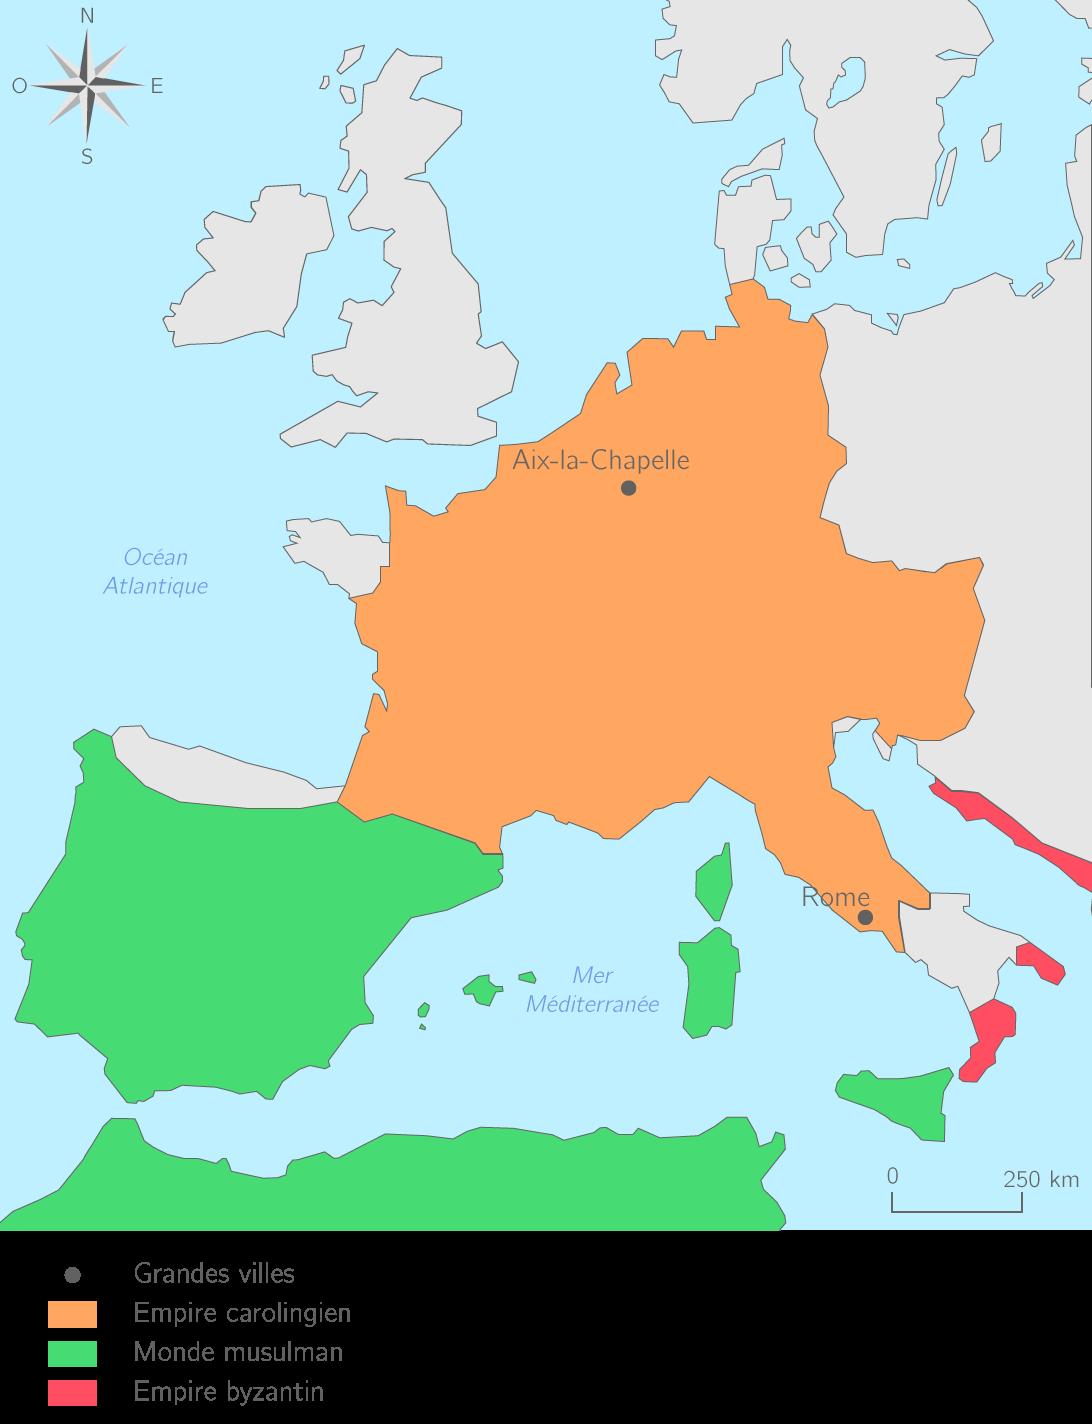 L'Empire carolingien à la mort de Charlemagne en 814